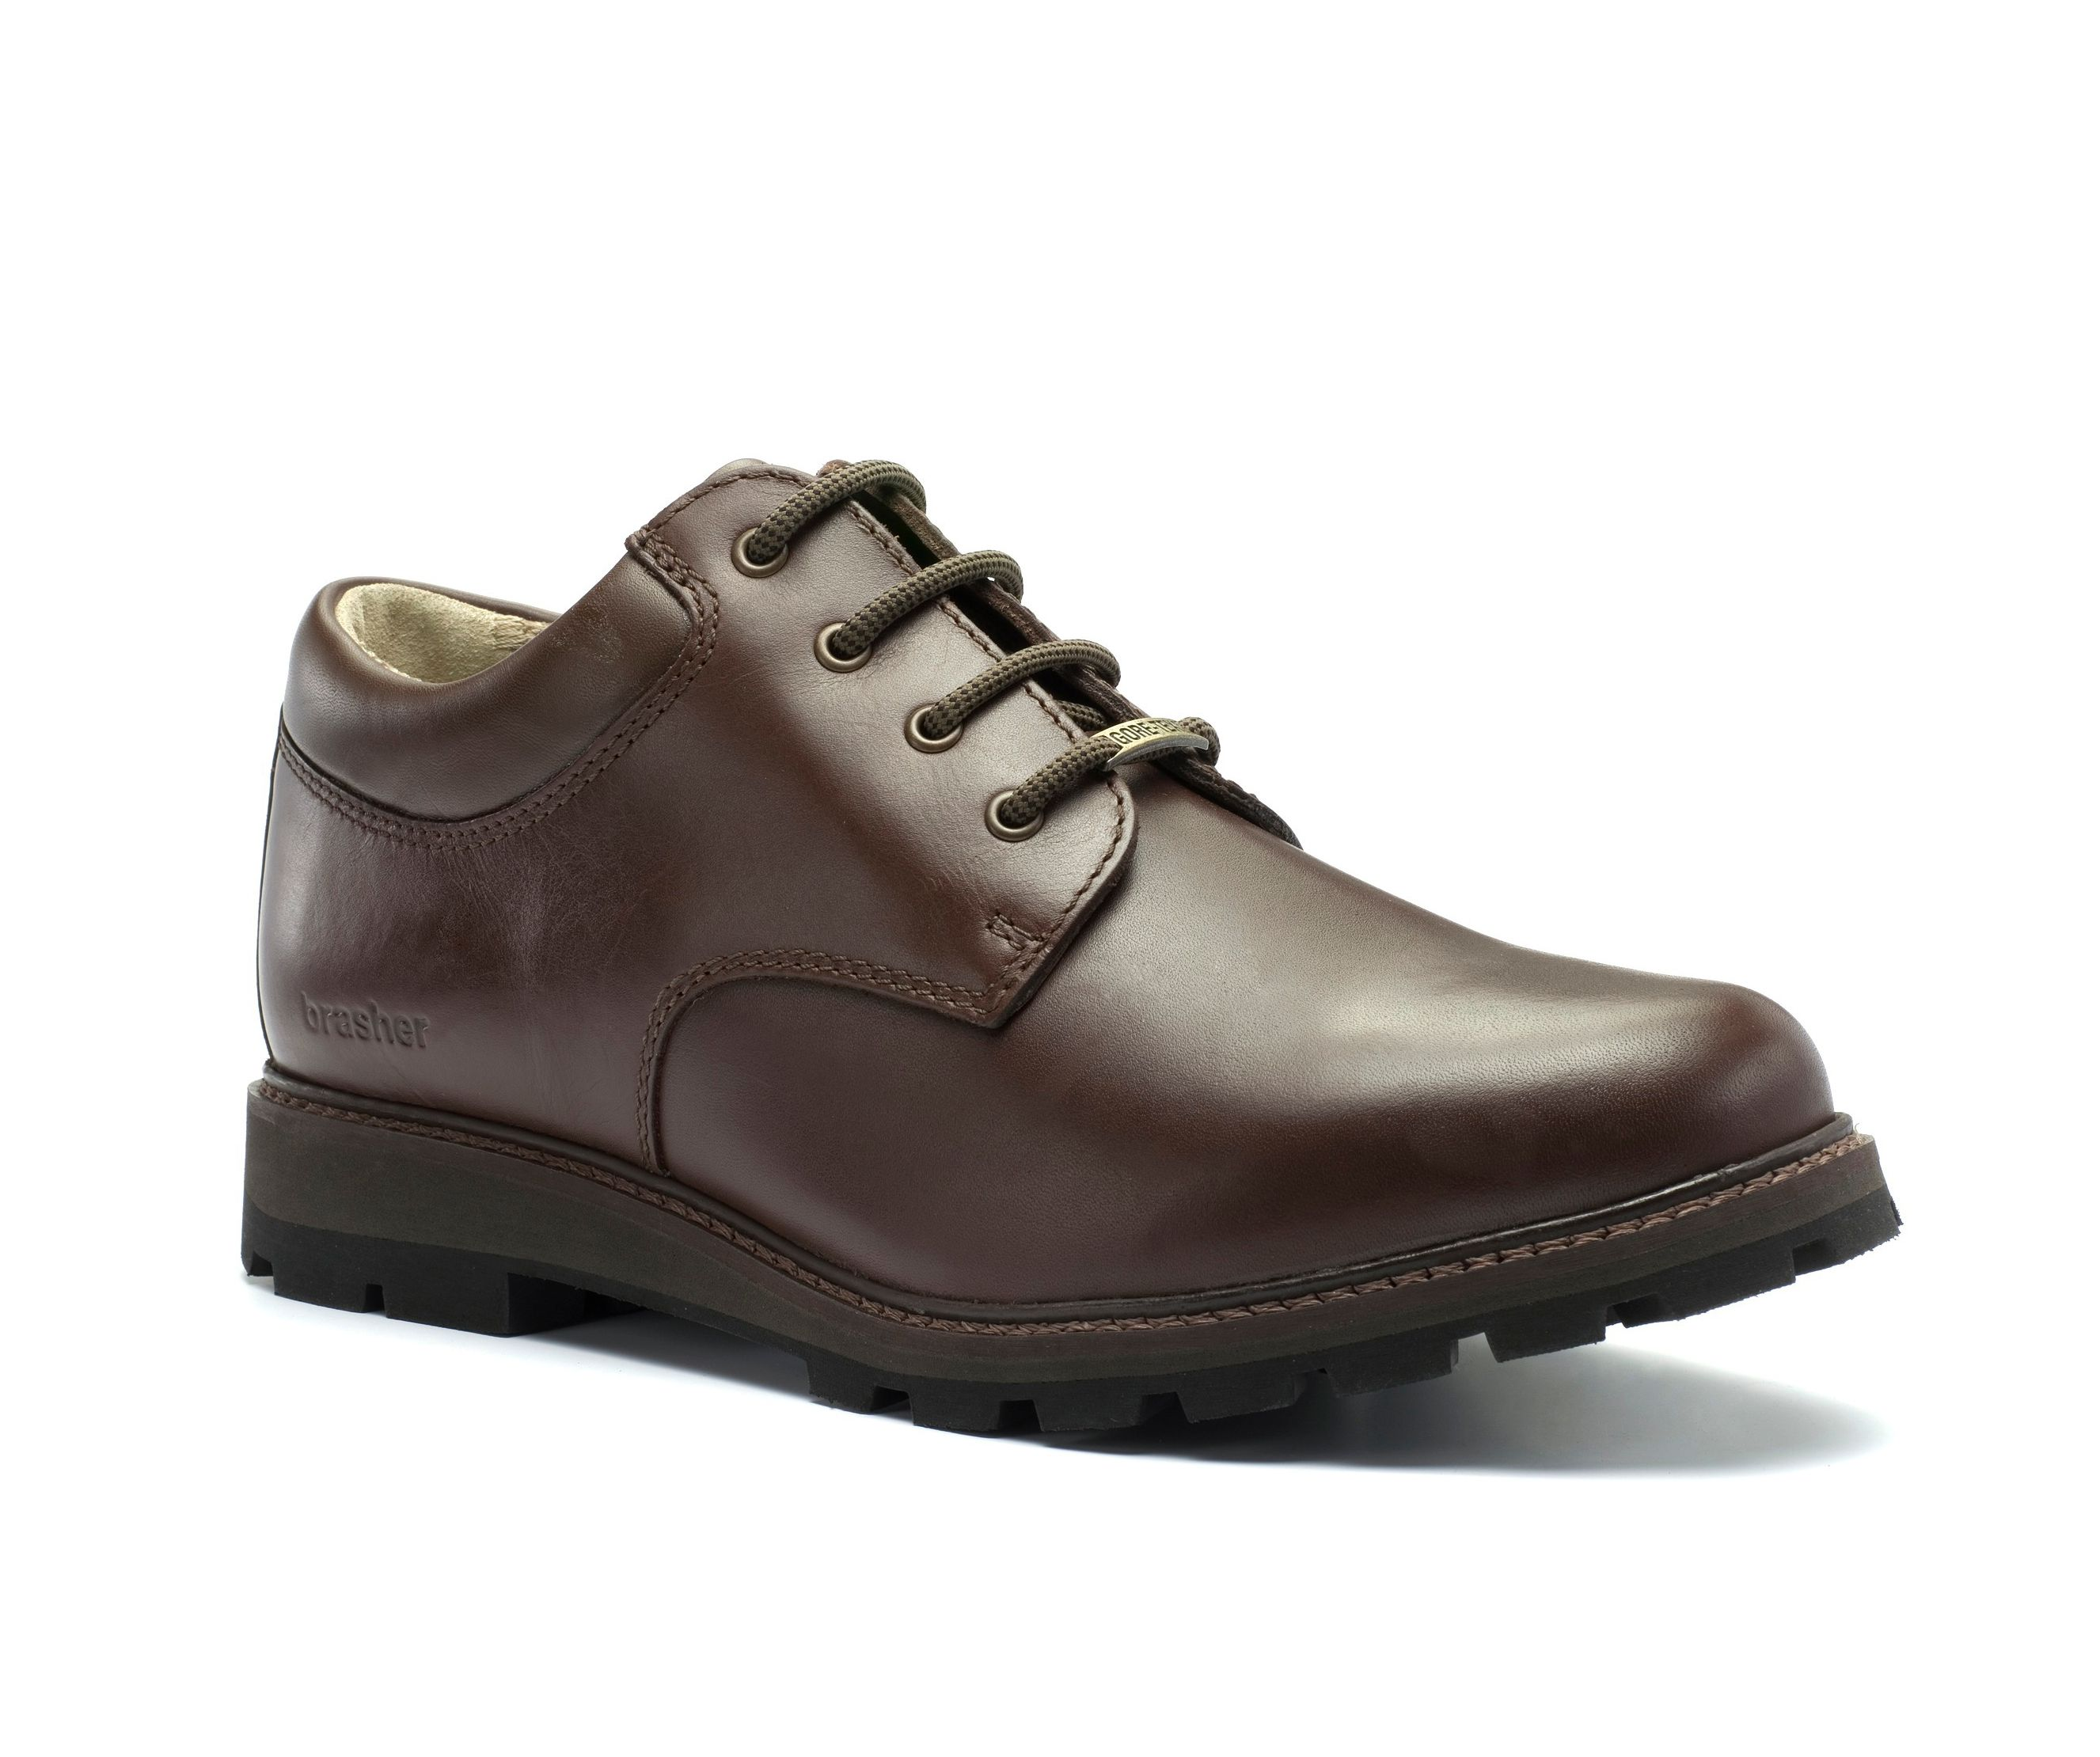 Brasher Country Roamer Walking Shoe